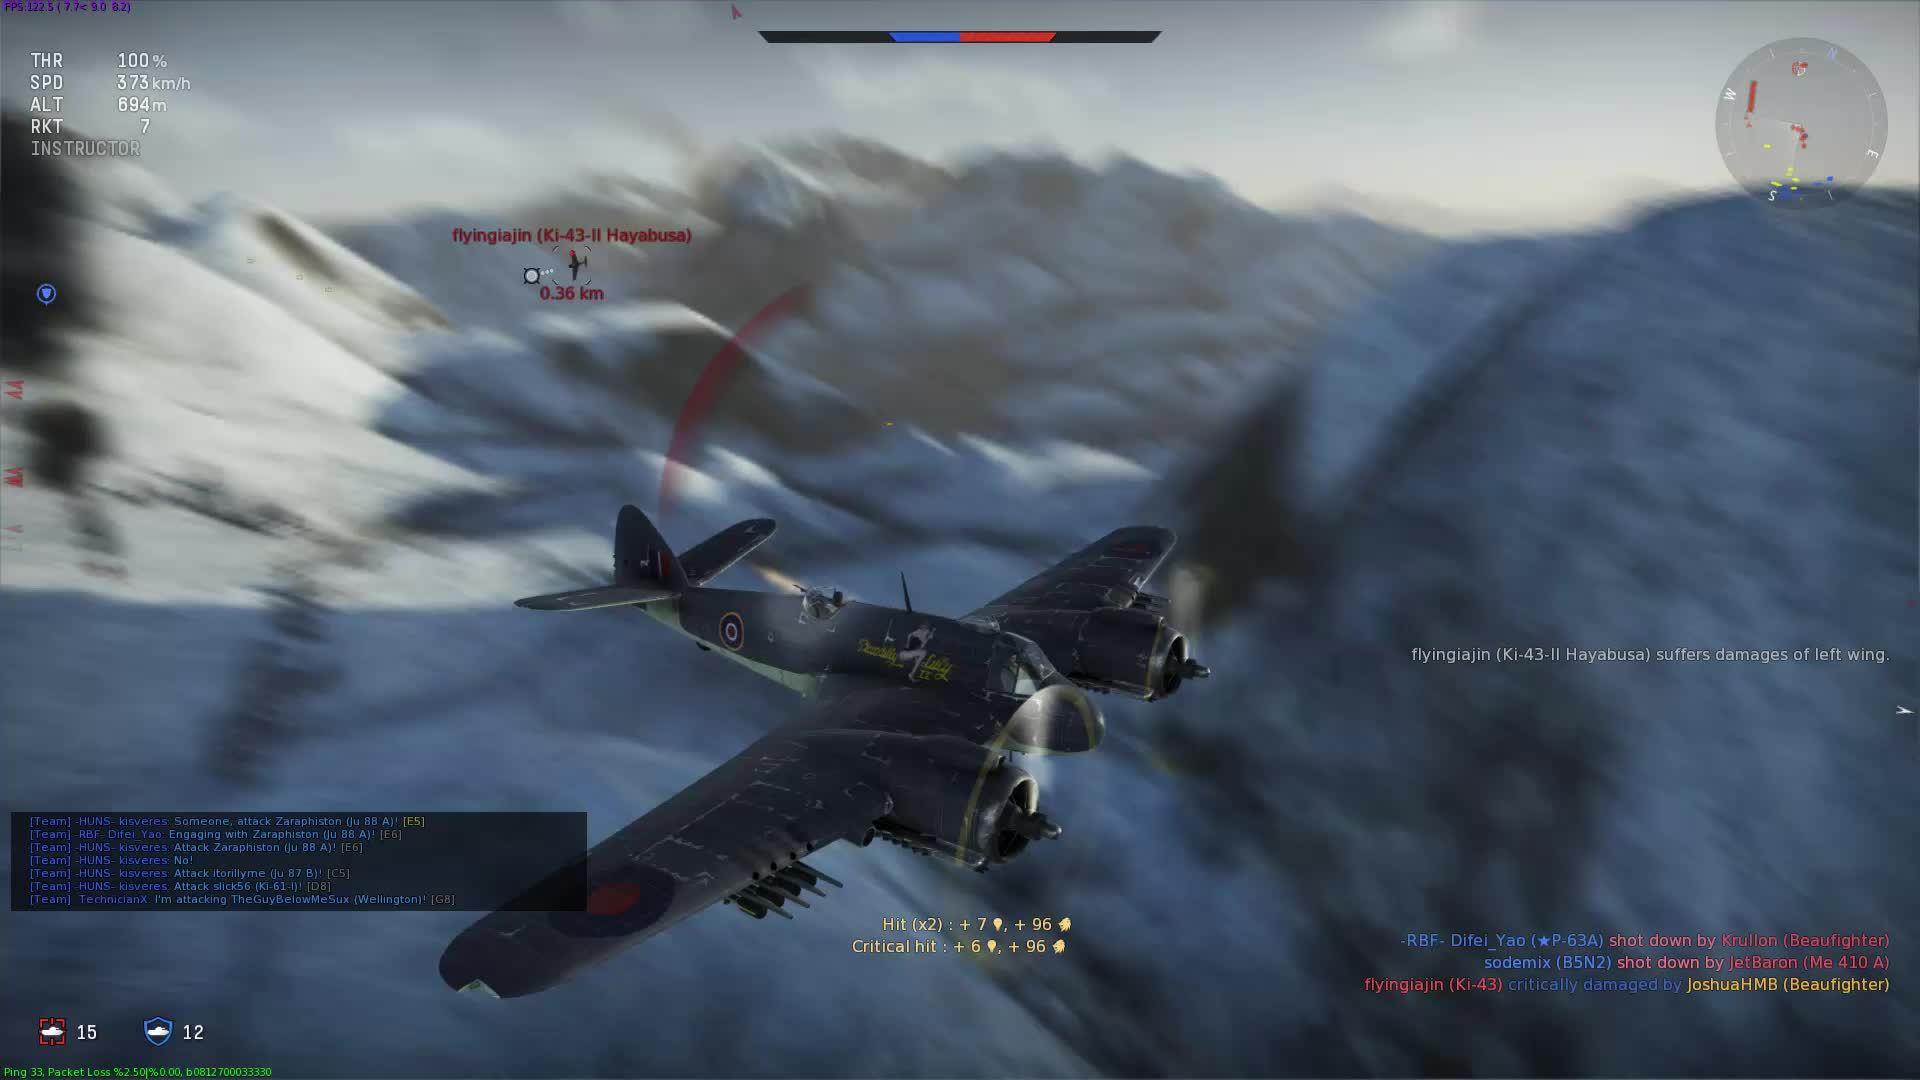 60fpsgaminggifs, Making my Final Stand [War Thunder] (reddit) GIFs